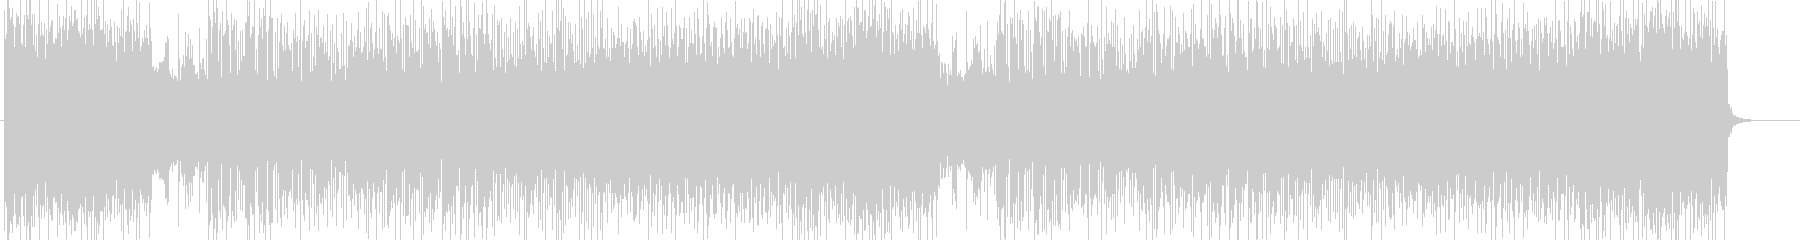 「HR/HM」「POWER」BGM209の未再生の波形